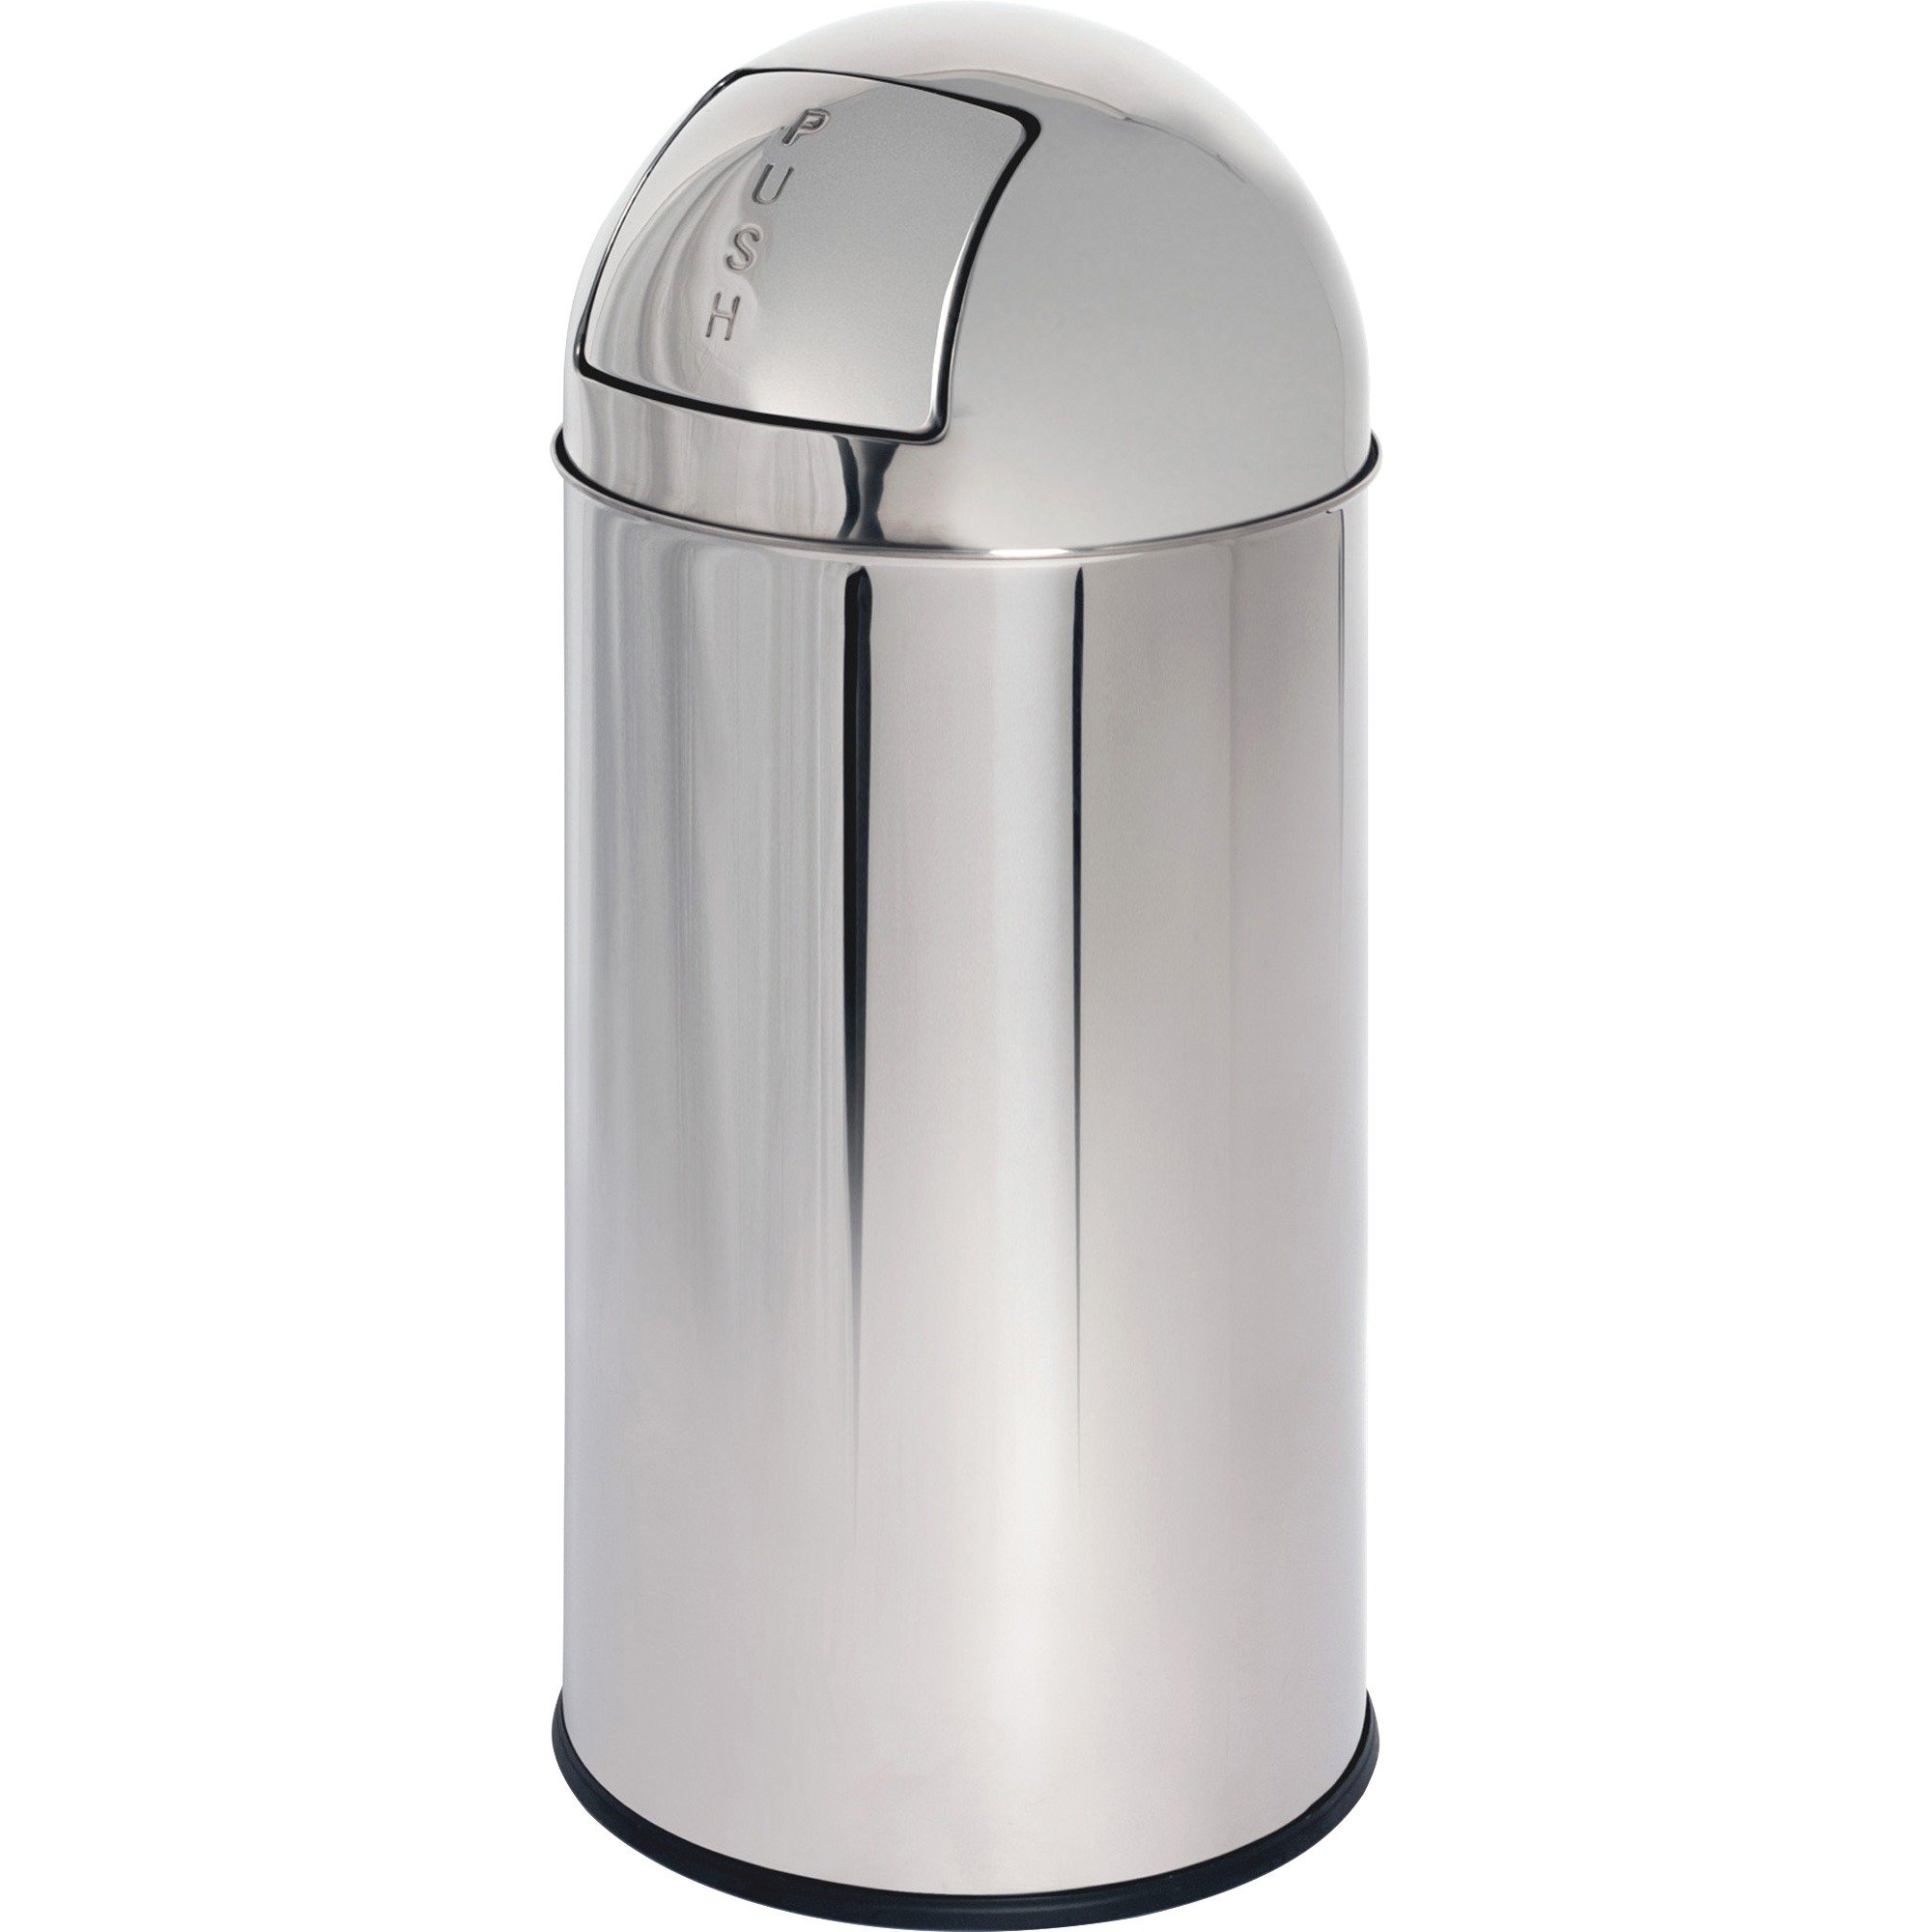 Genuine Joe GJO58885 Stainless Steel Classic Round Top Waste Receptacle, 12 gallon Capacity